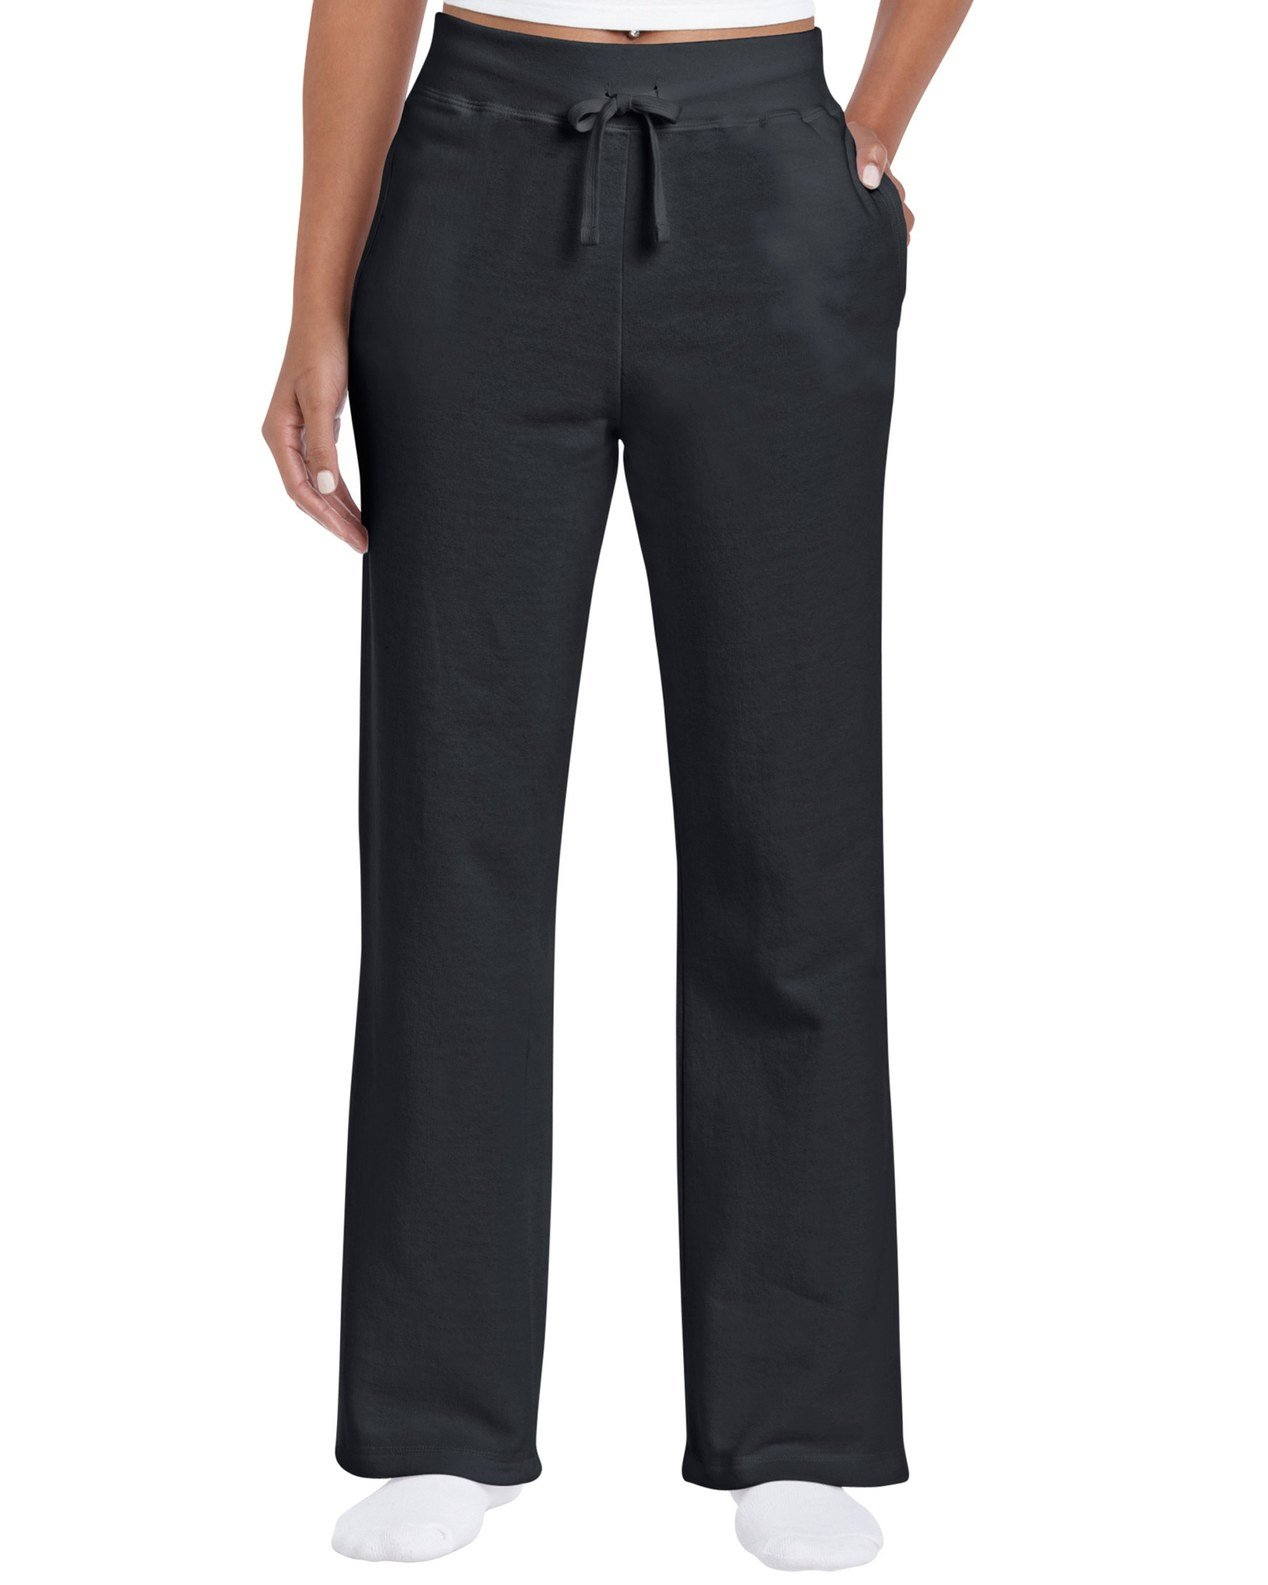 Gildan Women's Open Bottom Sweatpants, Black, Medium